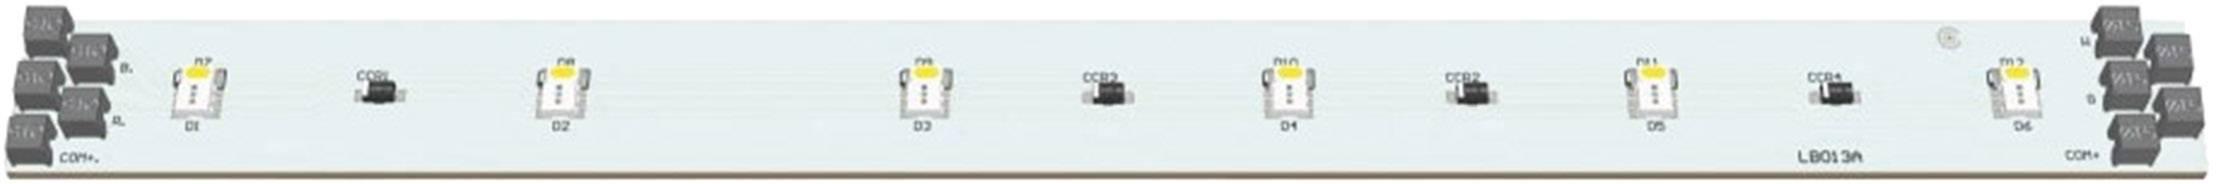 LED modul Barthelme 50752031, 120 °, 42 lm, 2.16 W, 24 V, RGB